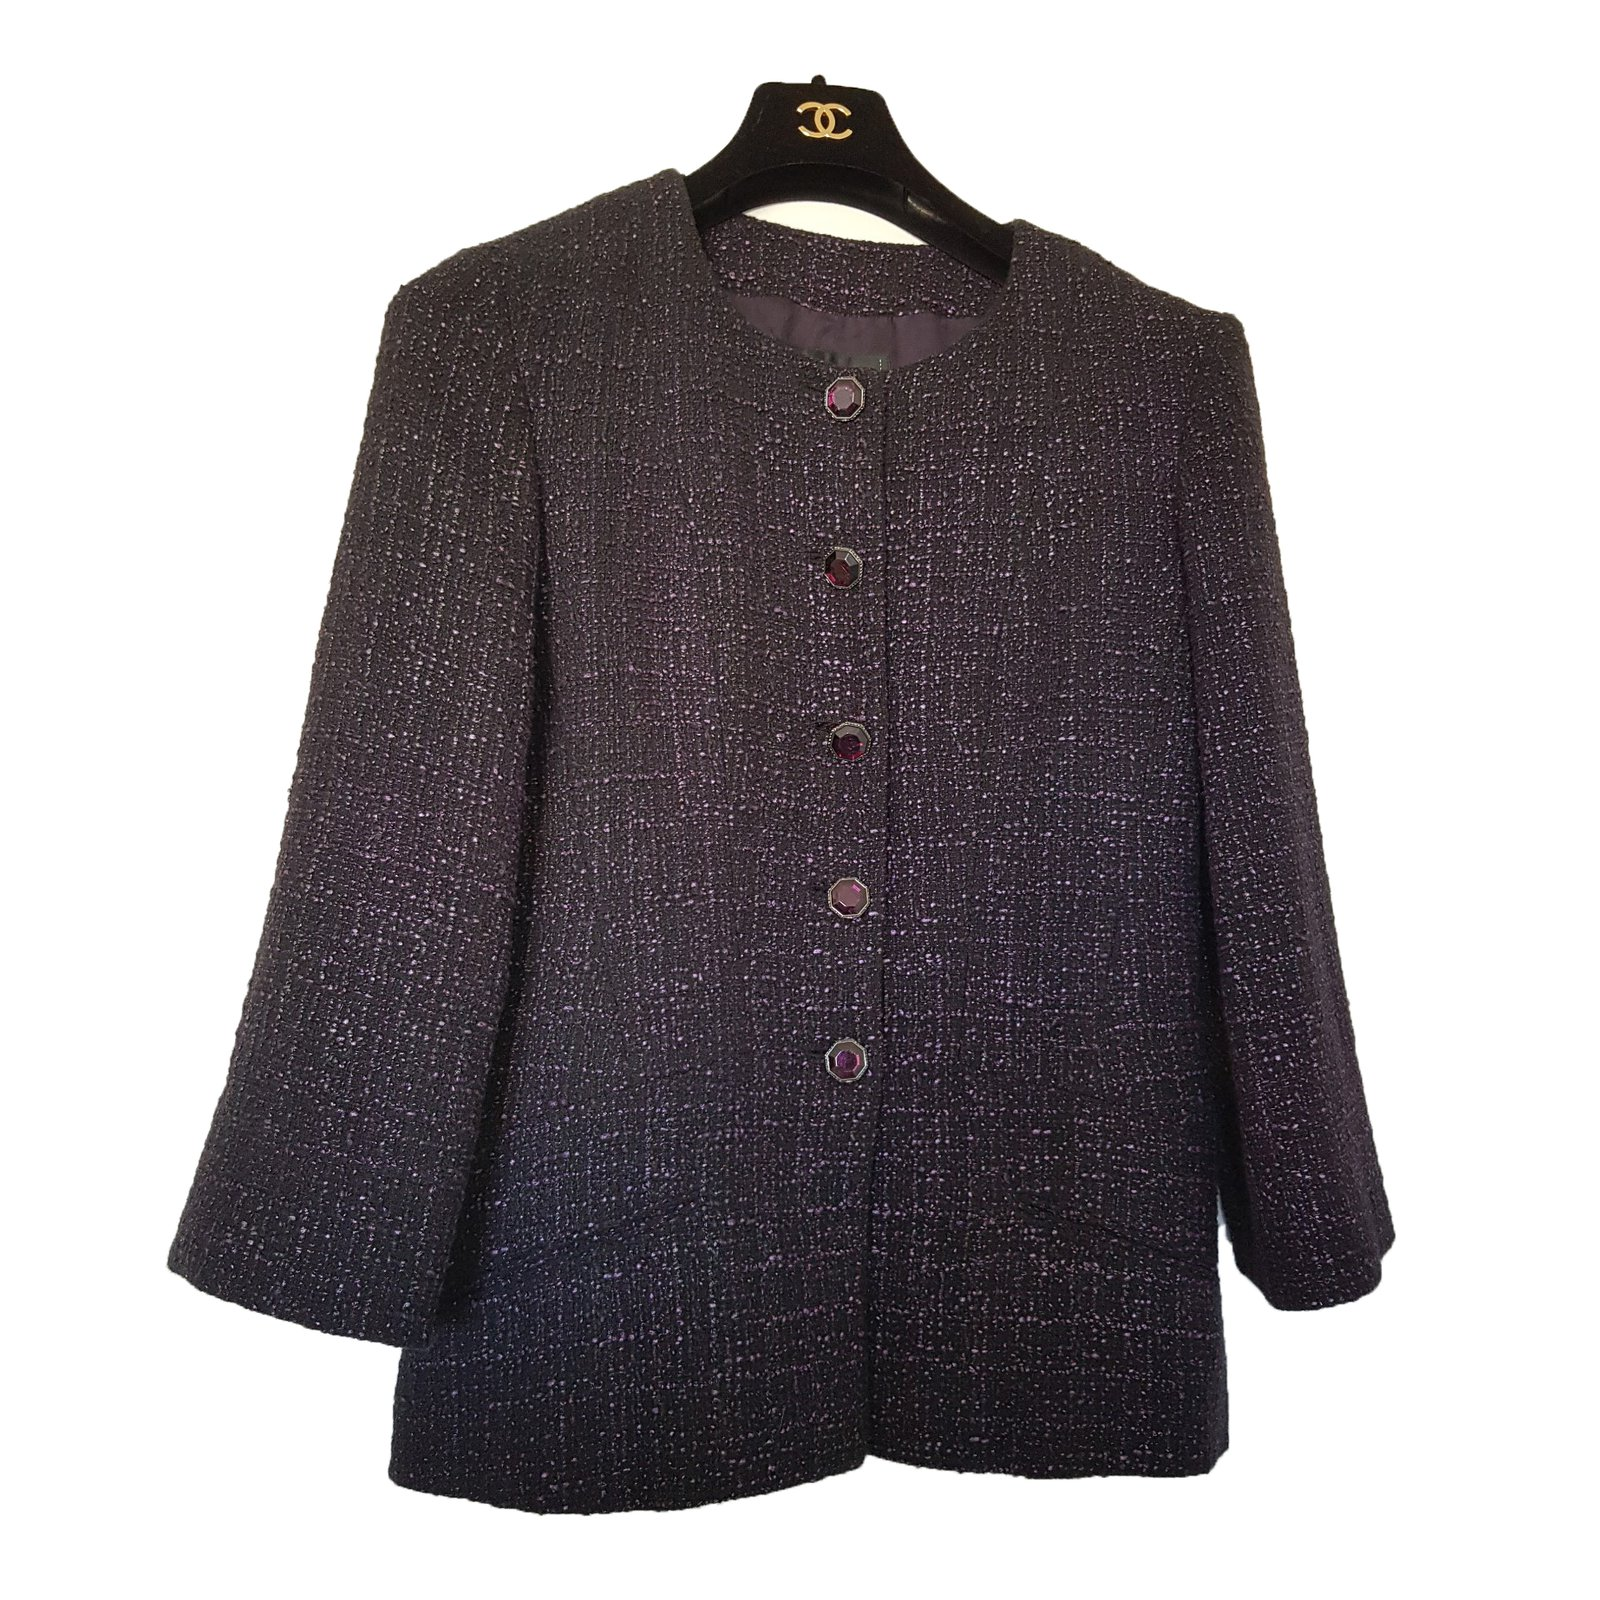 Vestes Chanel Veste Tweed Coton Autre Ref 77285 Joli Closet